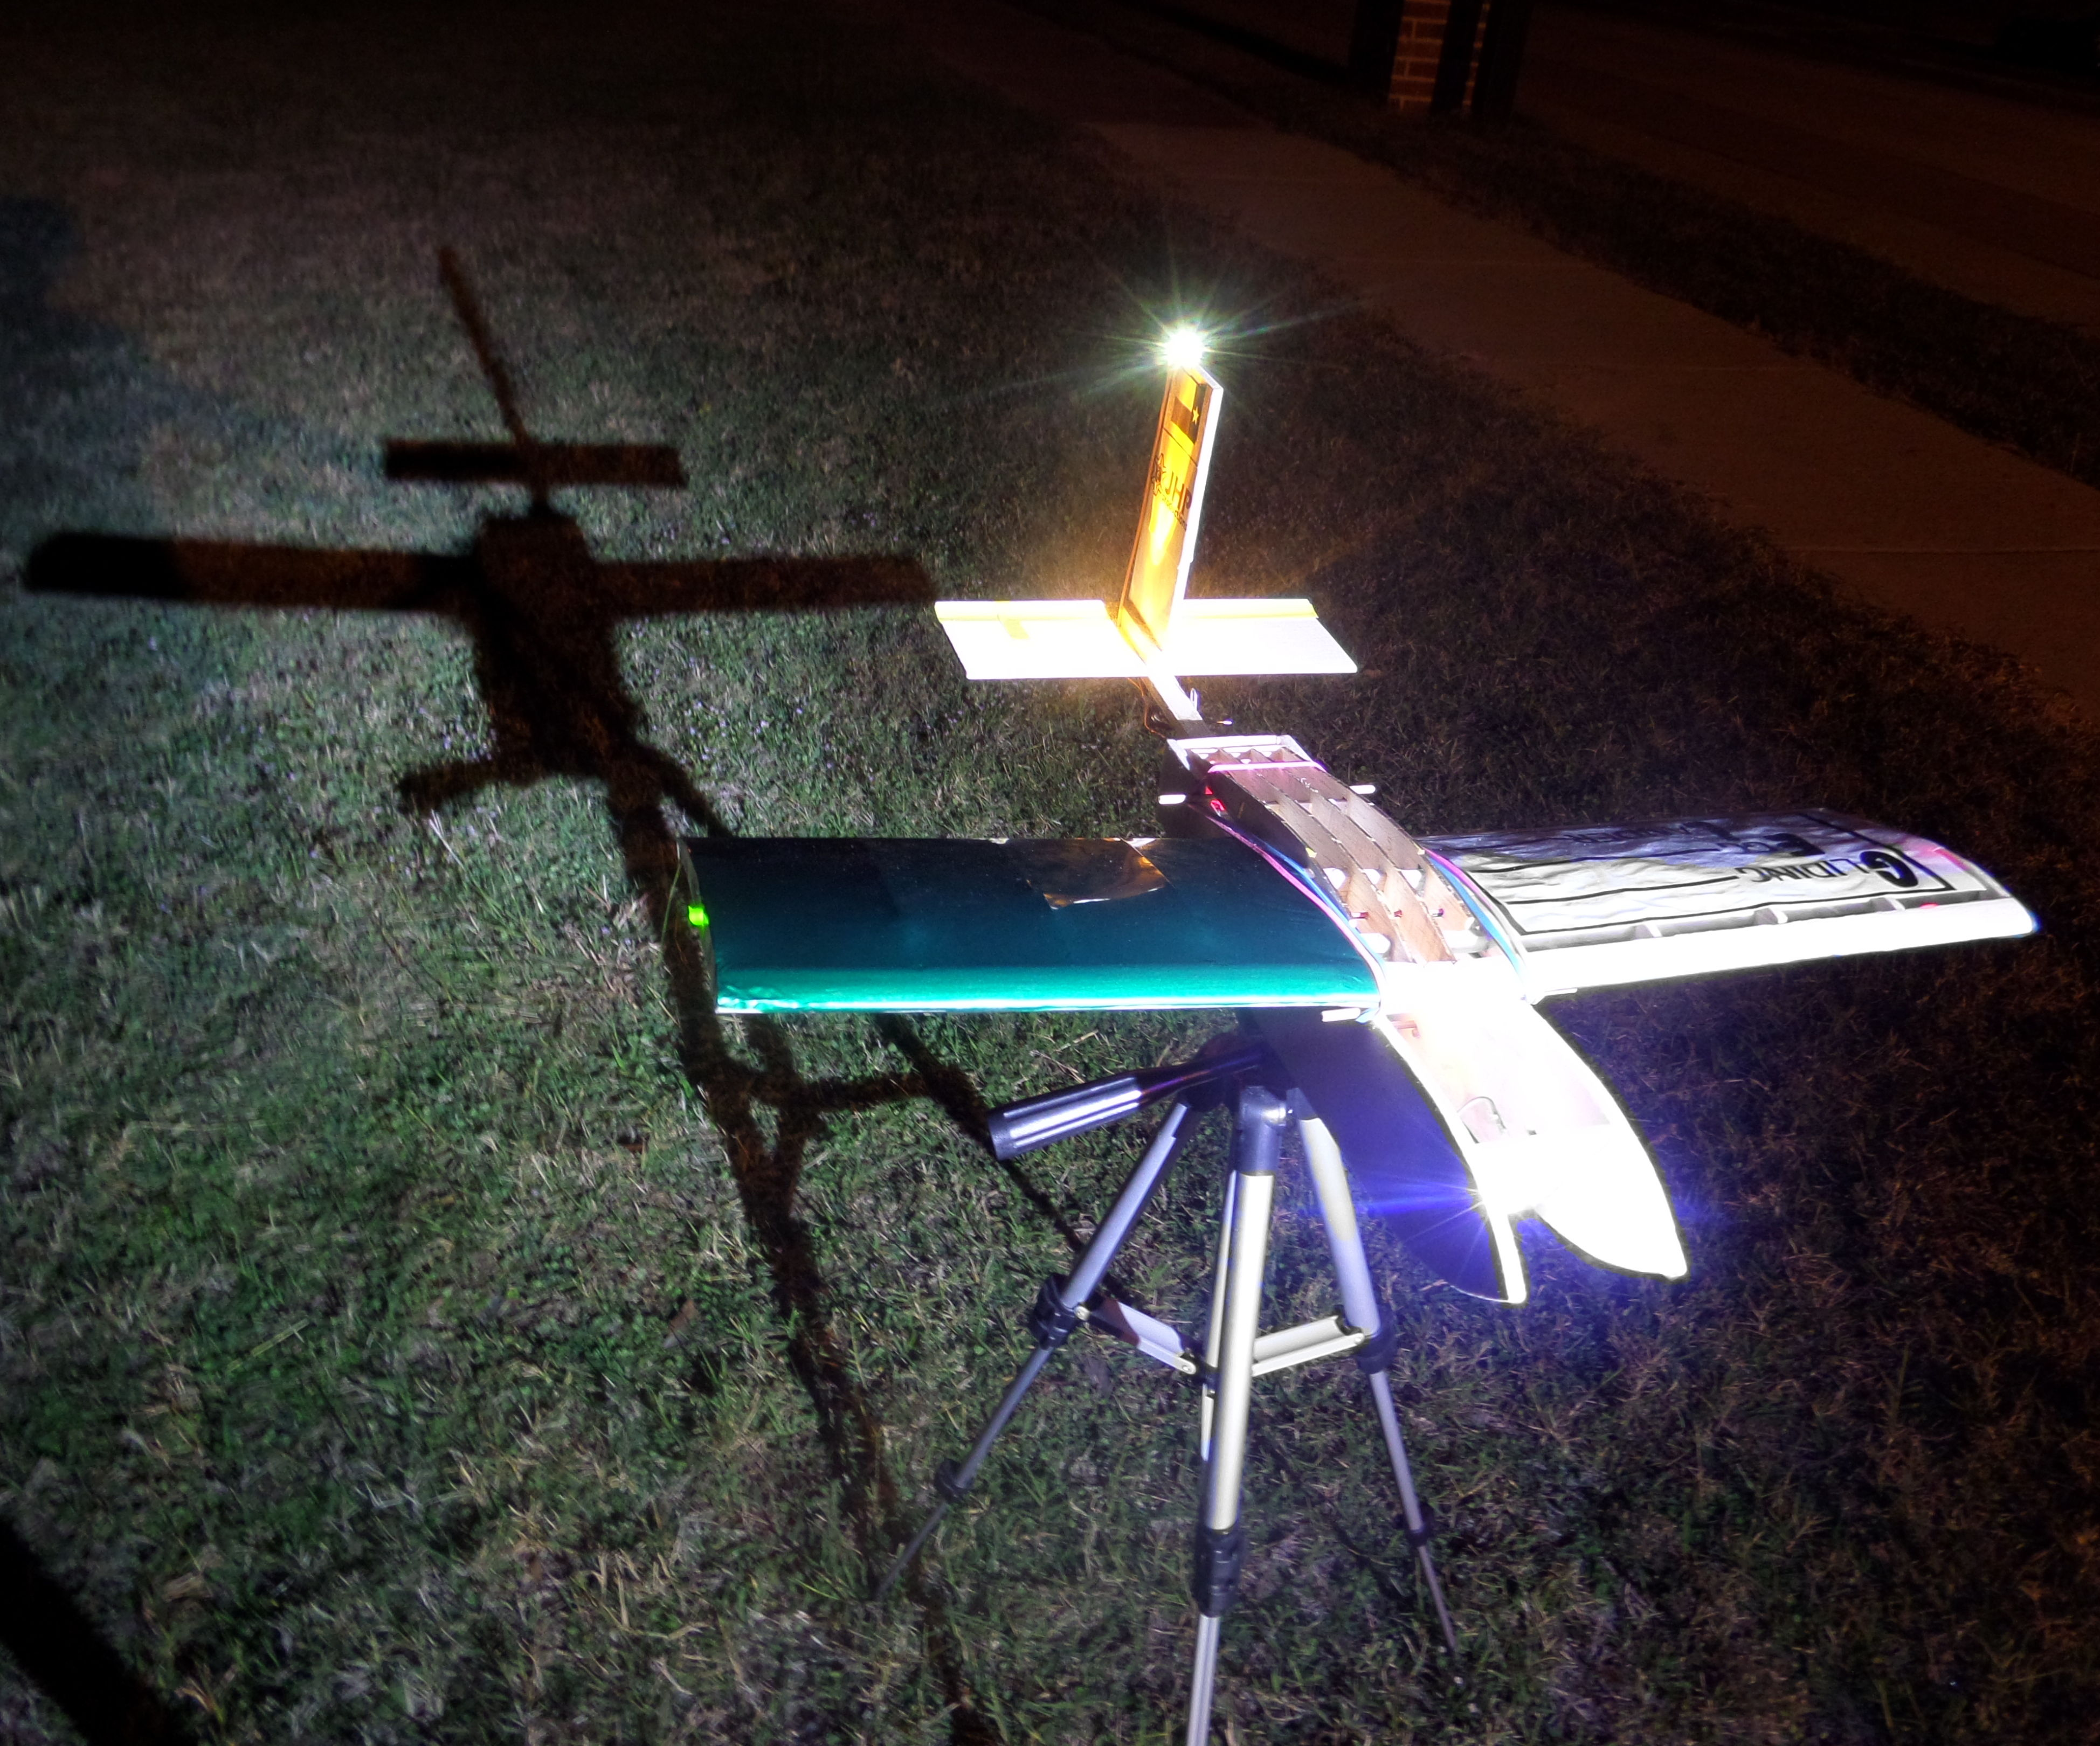 Gliding Egg Lander (Balsa Wood Plane)